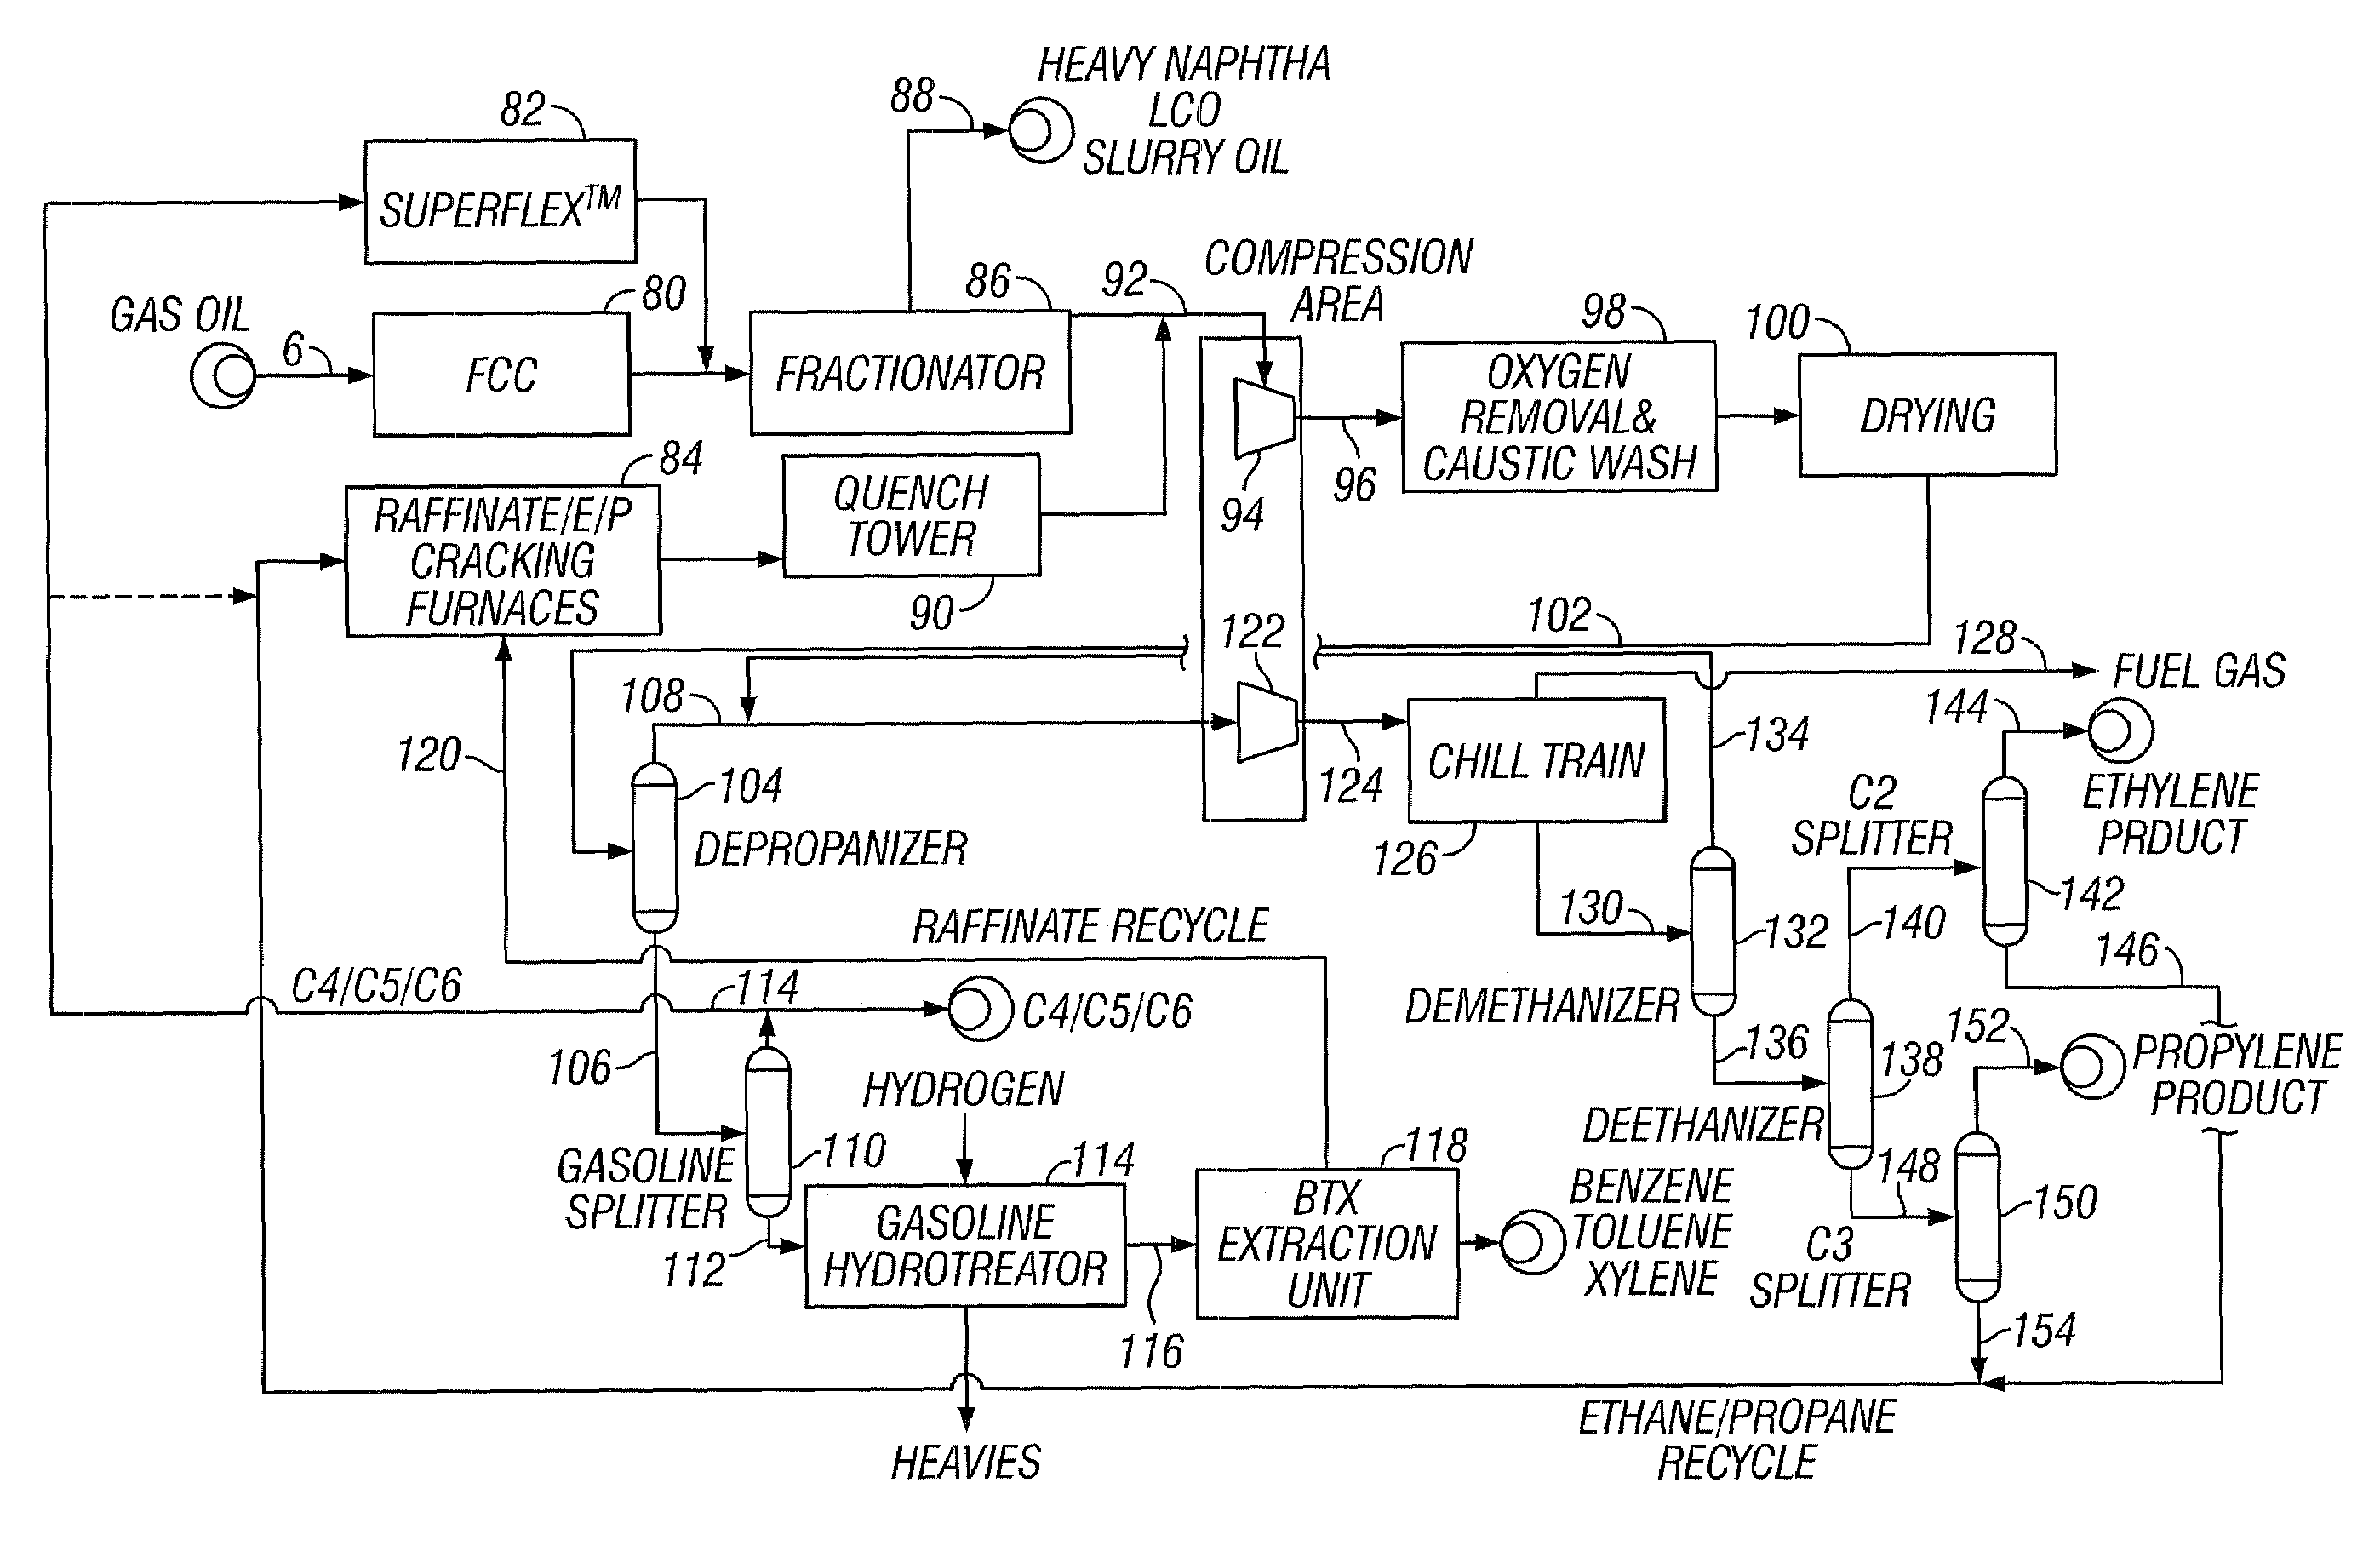 fischer tropsch process flow diagram hierarchy template olefins free engine image